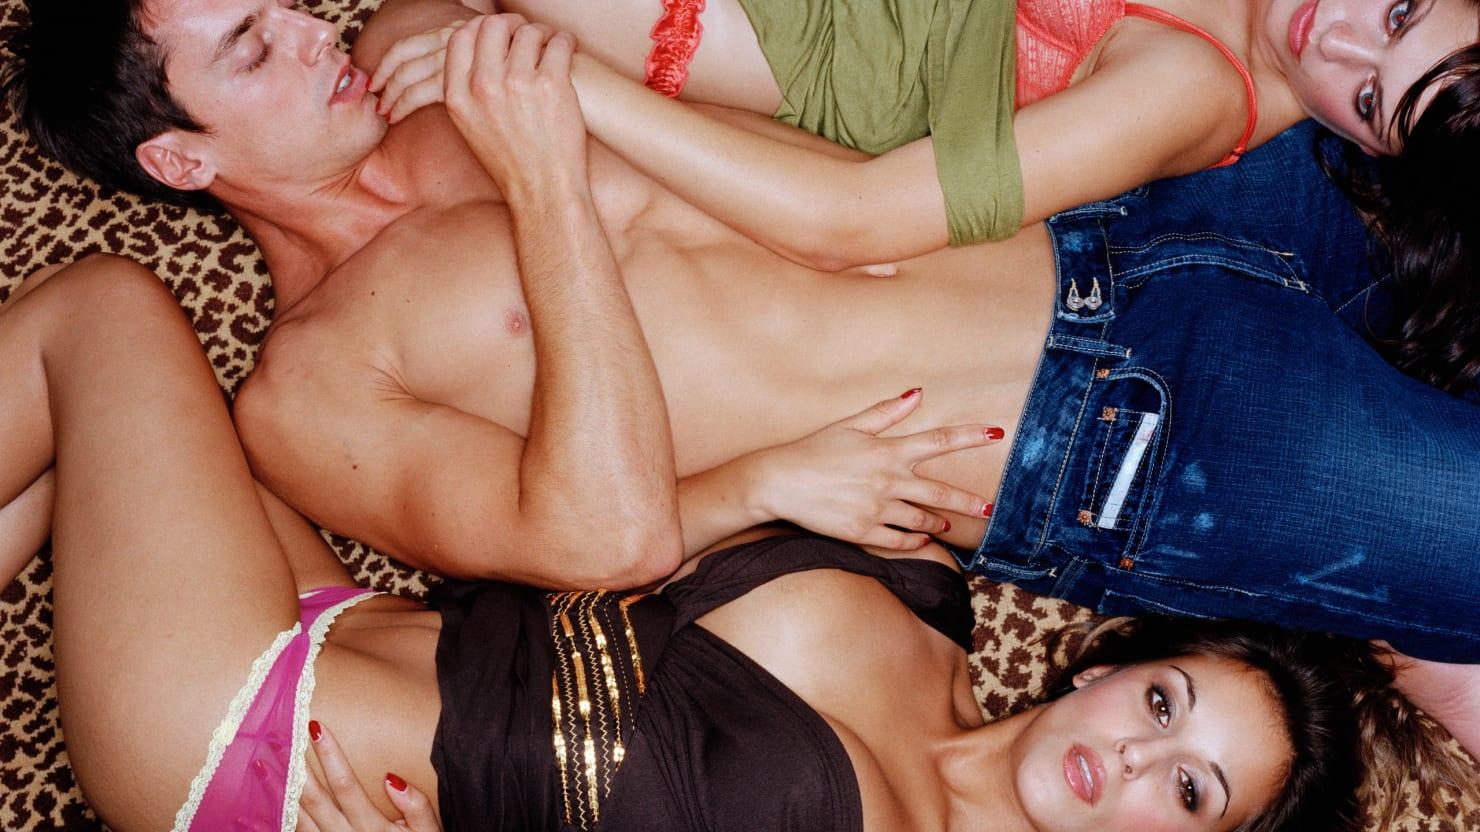 mad guys hot threesome